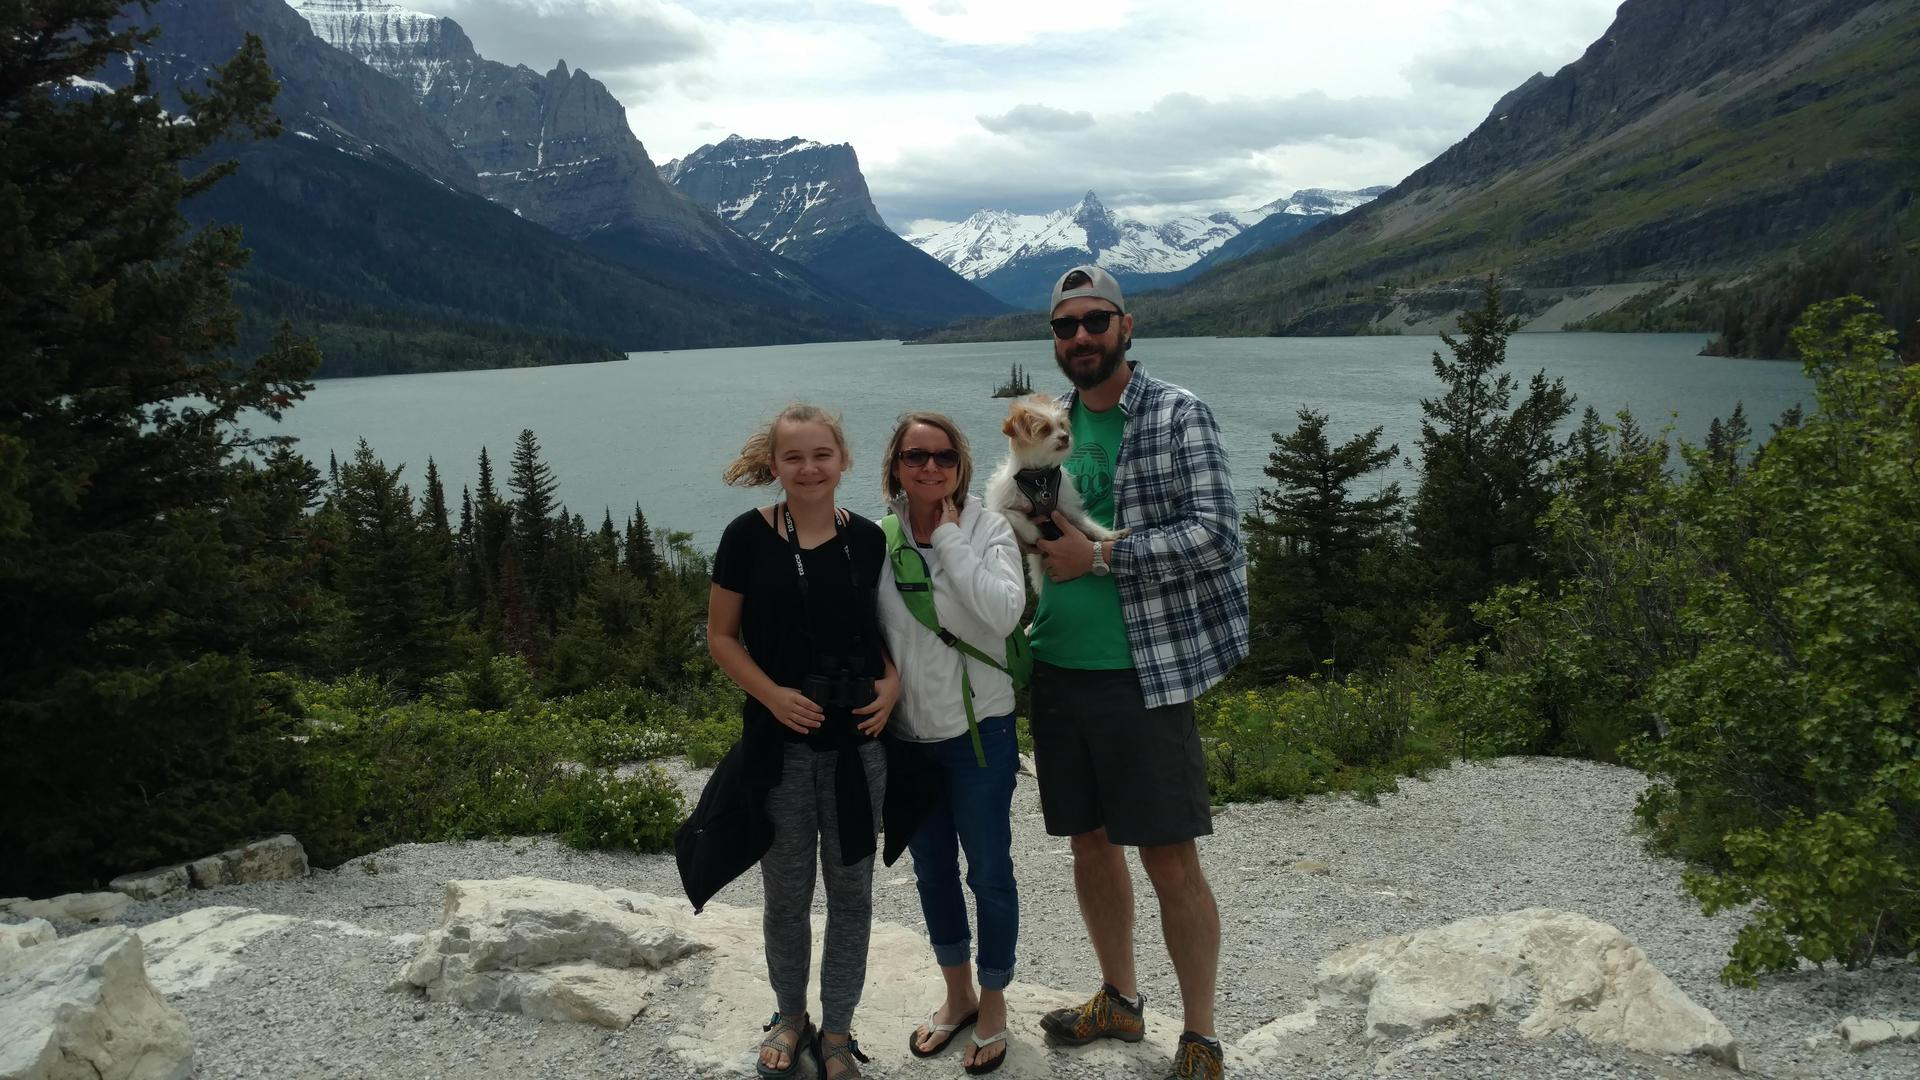 Banff National Park of Canada